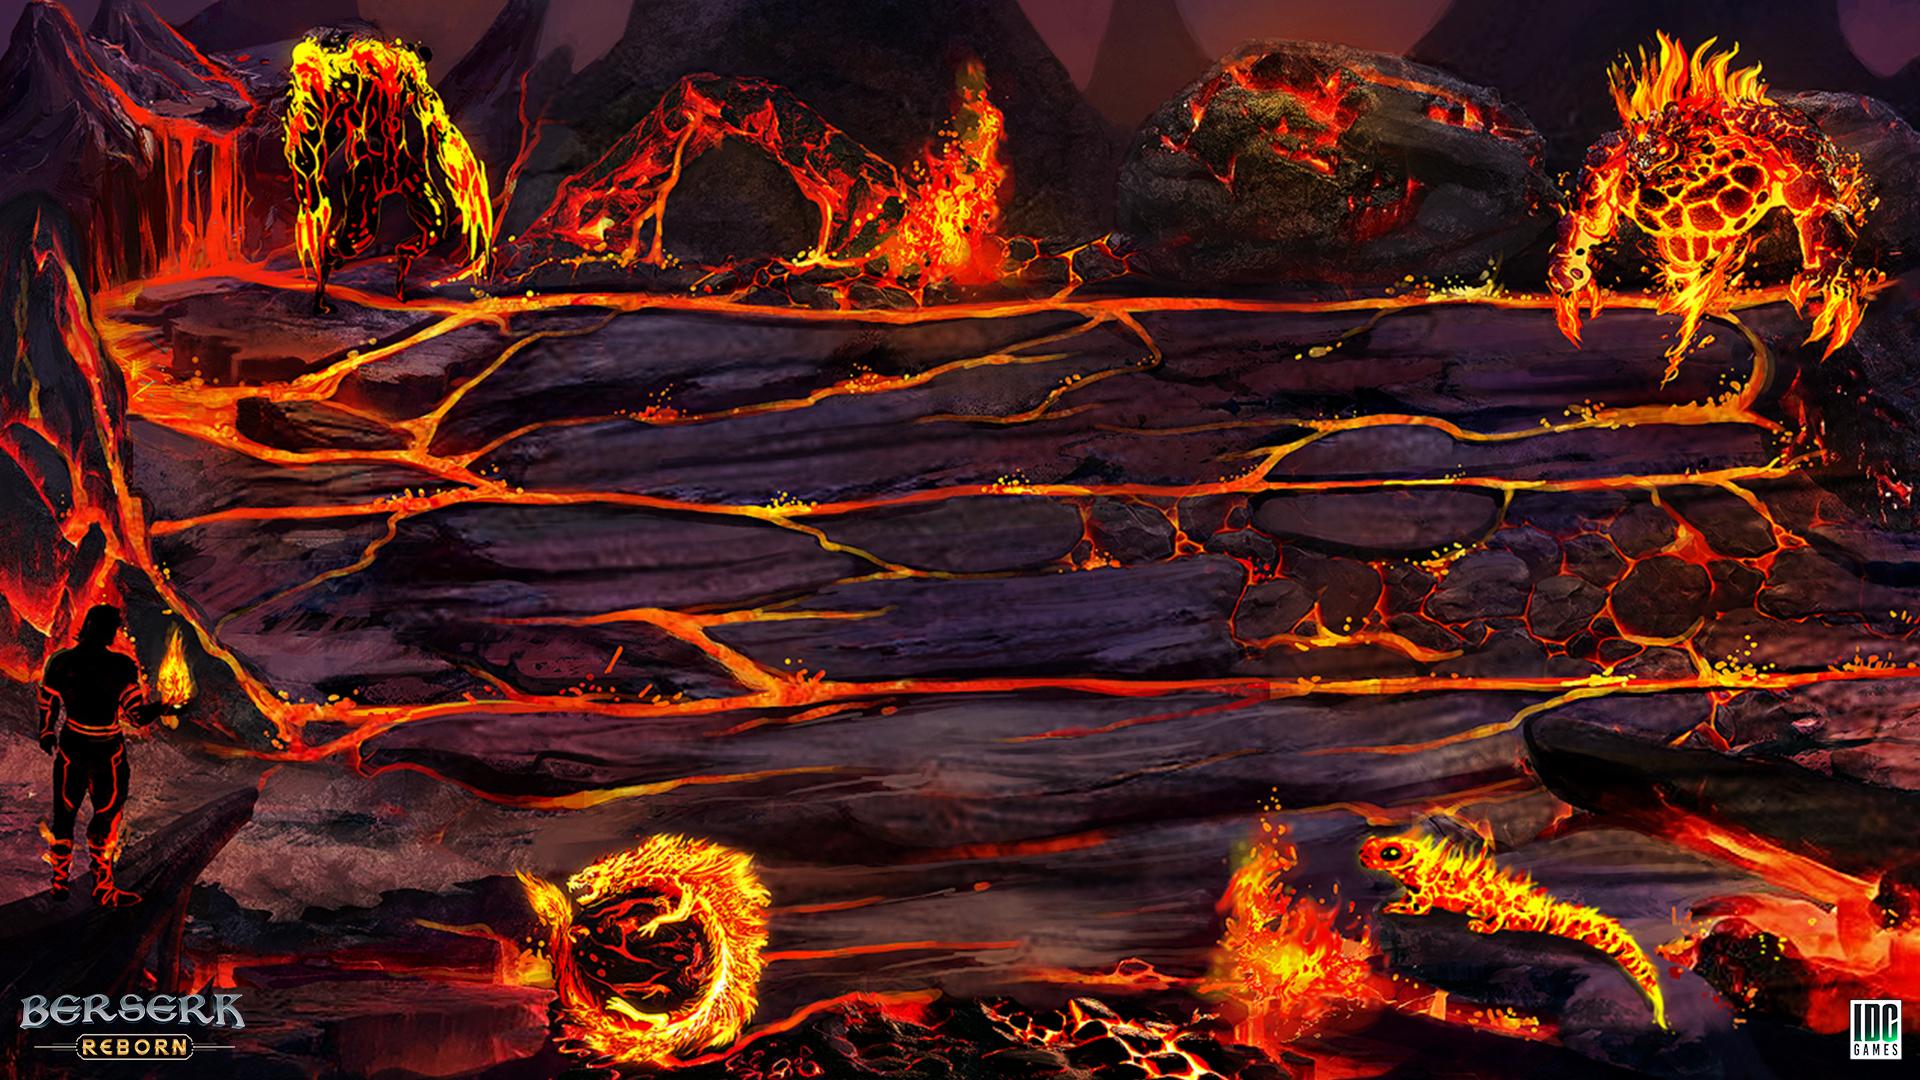 Berserk Reborn - Fire Wallpaper